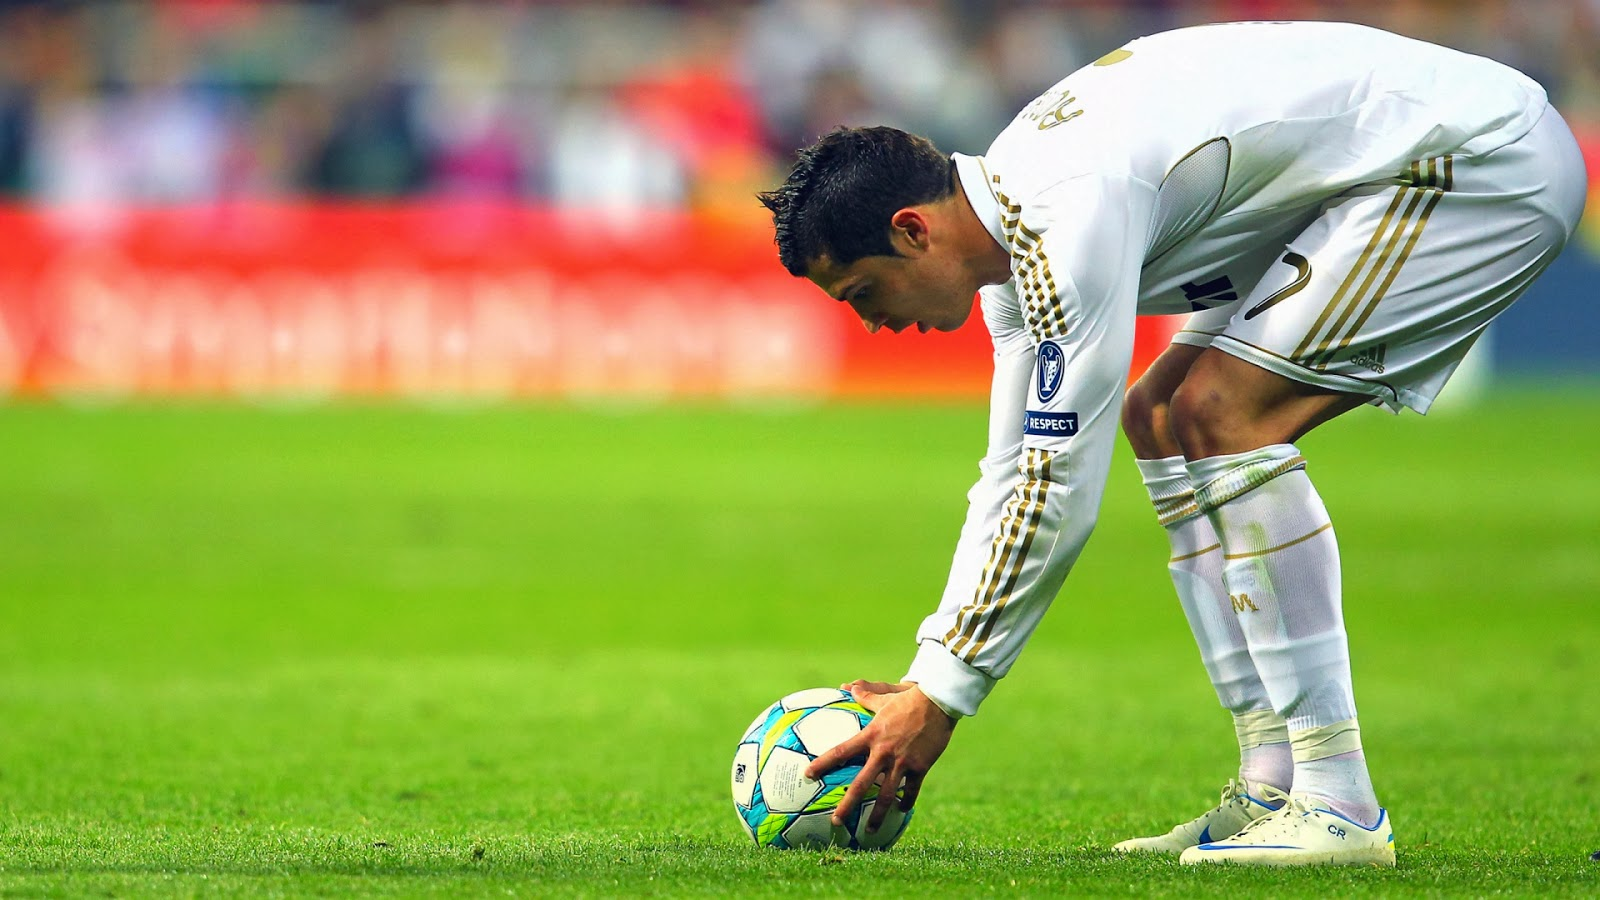 43 Cristiano Ronaldo Wallpaper 1080p On Wallpapersafari